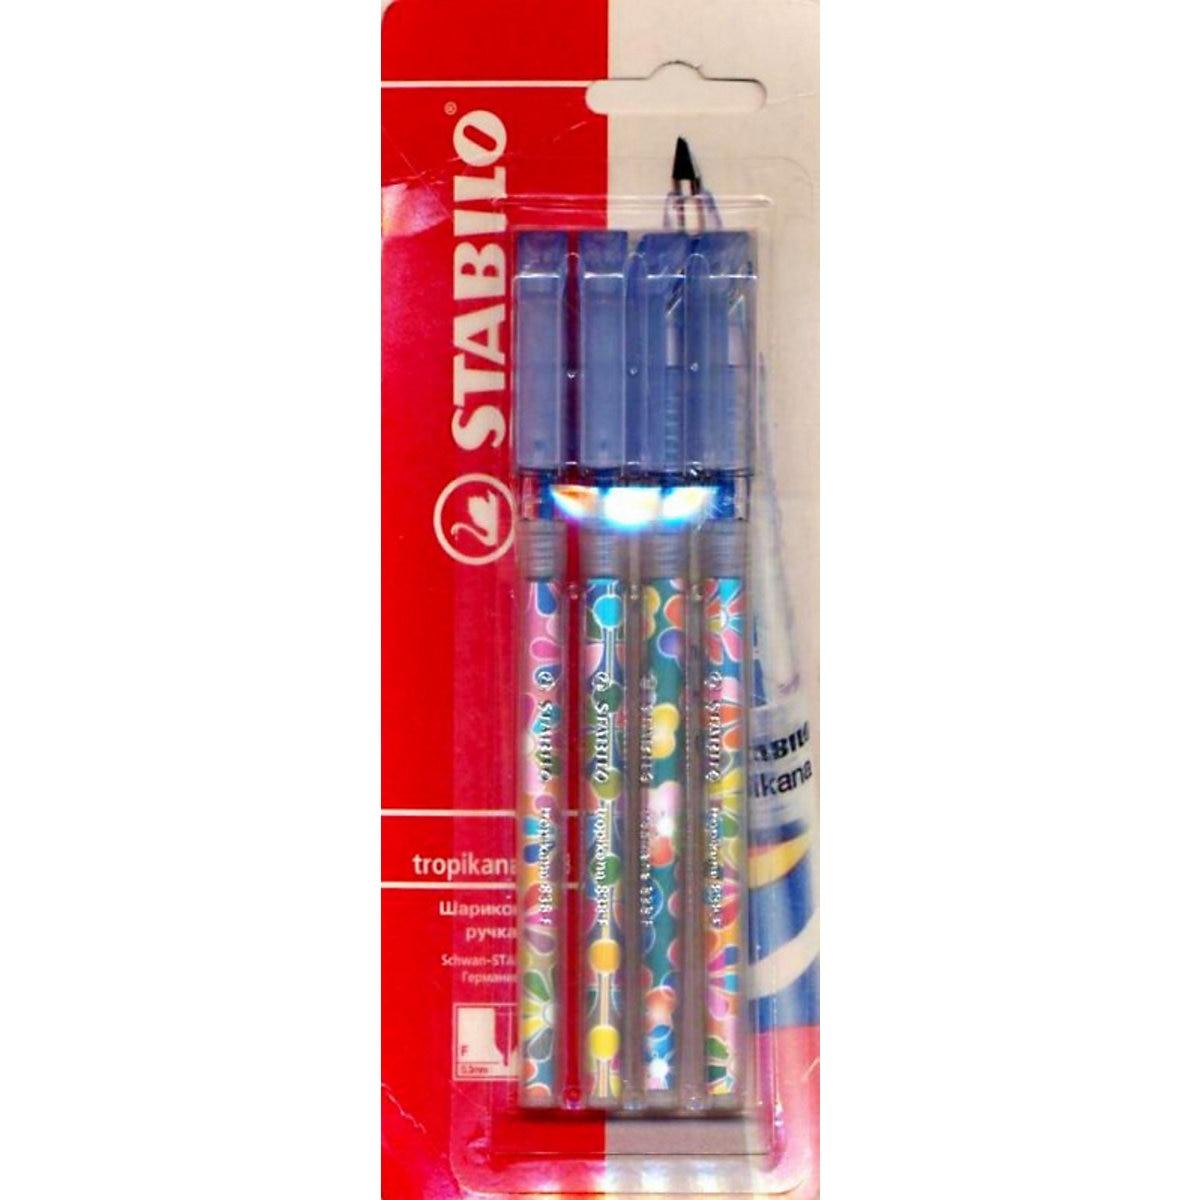 STABILO Ручка захвата 3157362 ручки шариковые гелевые карандаши Пишущие принадлежности MTpromo